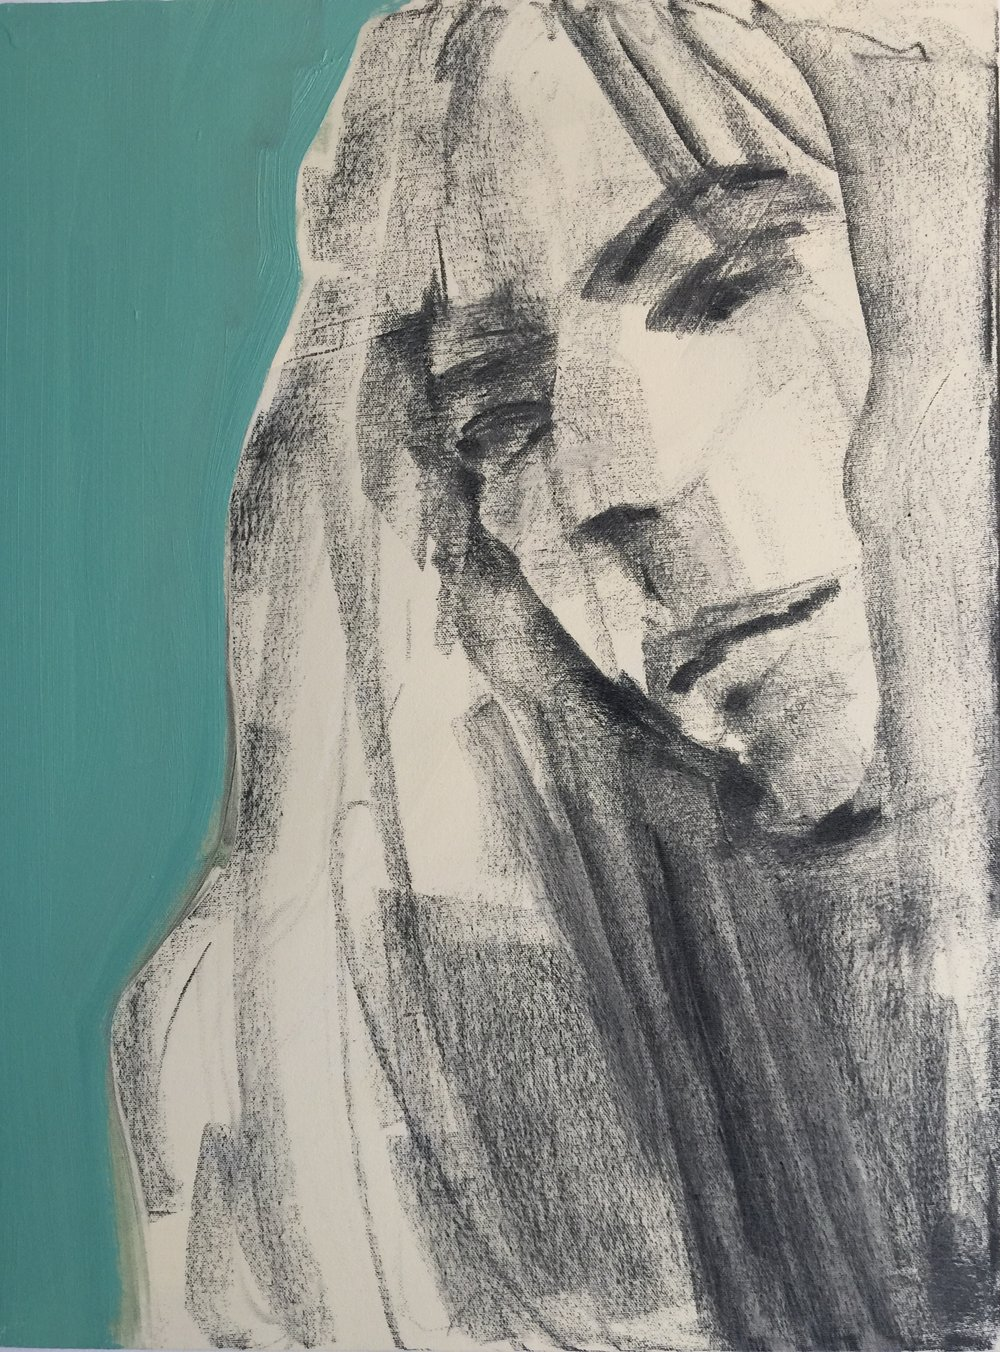 Patti Smith Land 250: 'Auto-portrait, New York'.